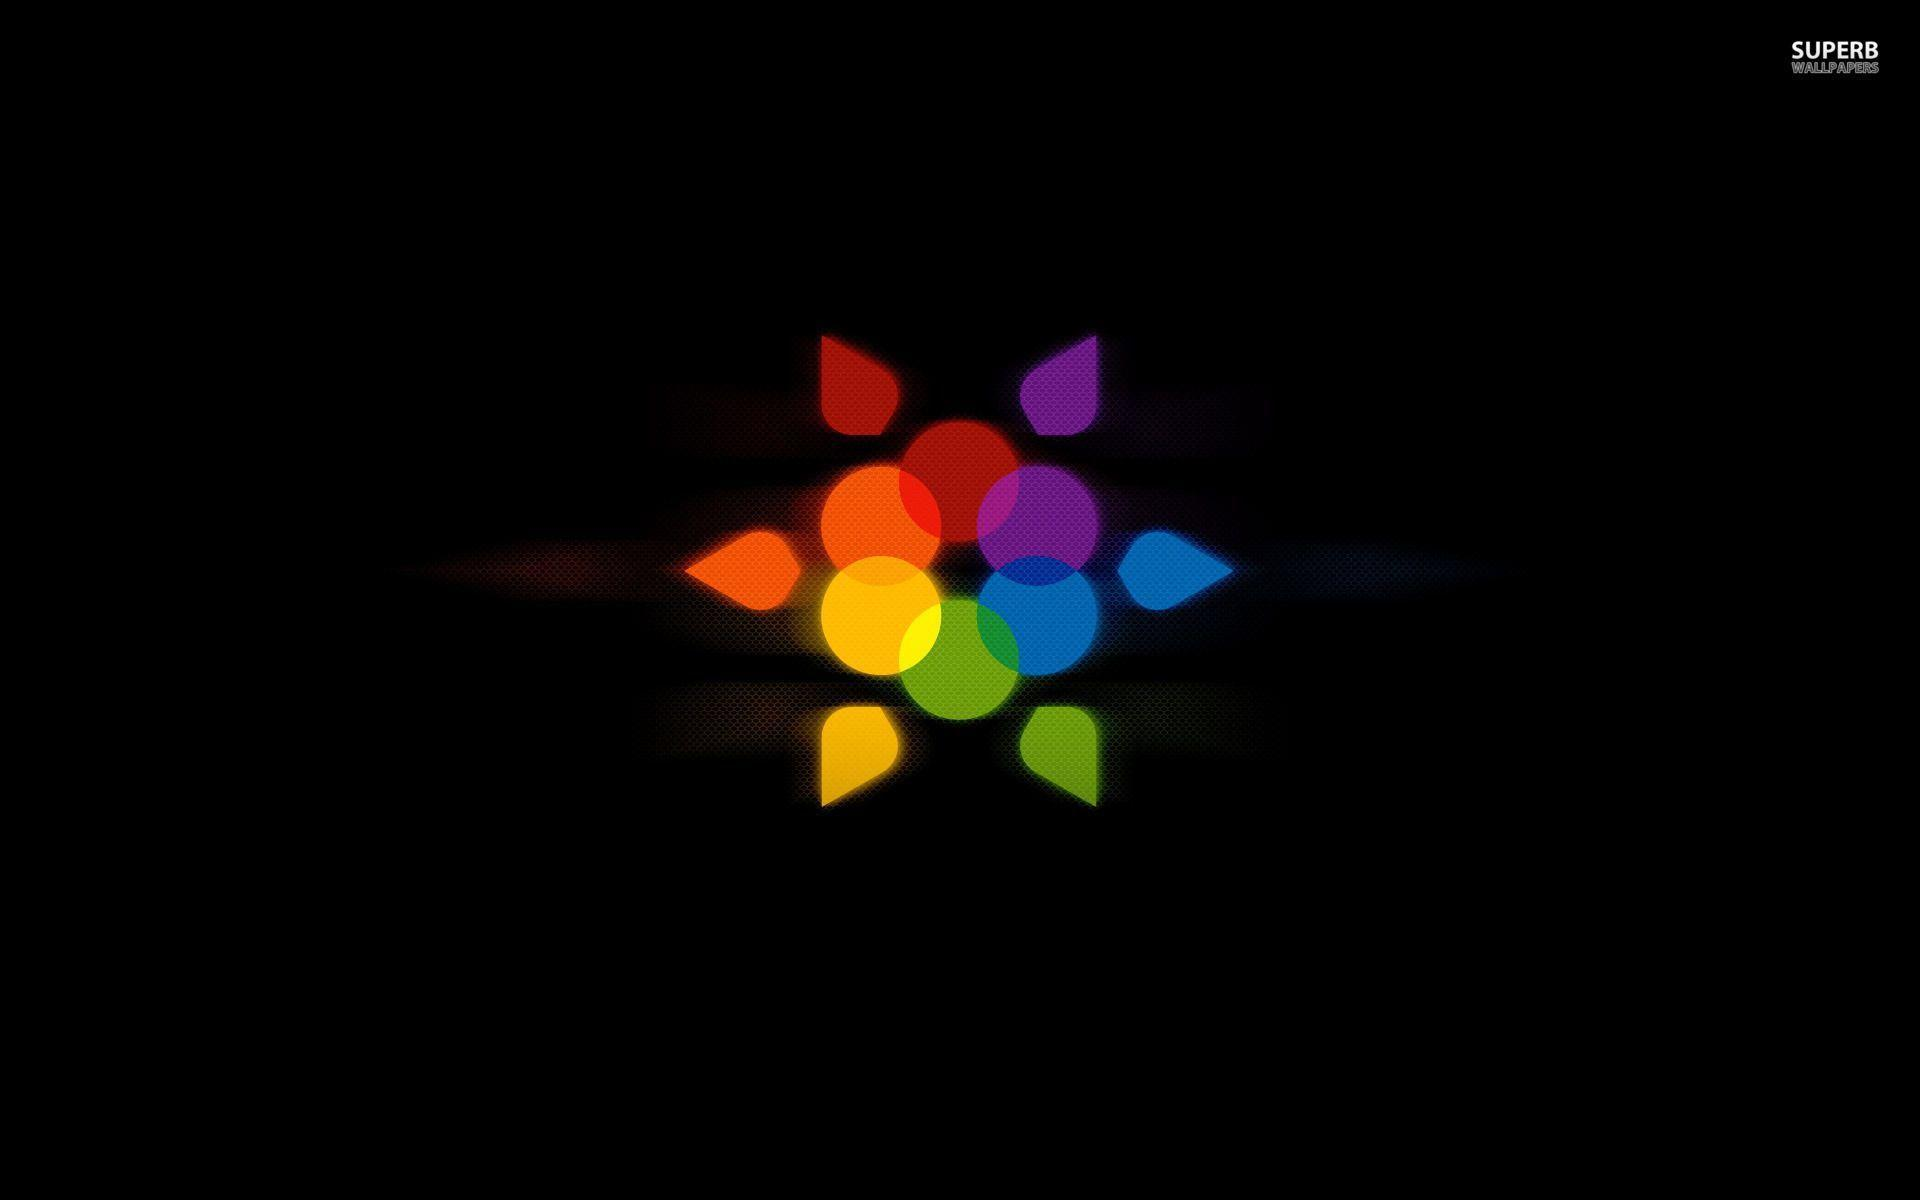 rainbow flower background - photo #26